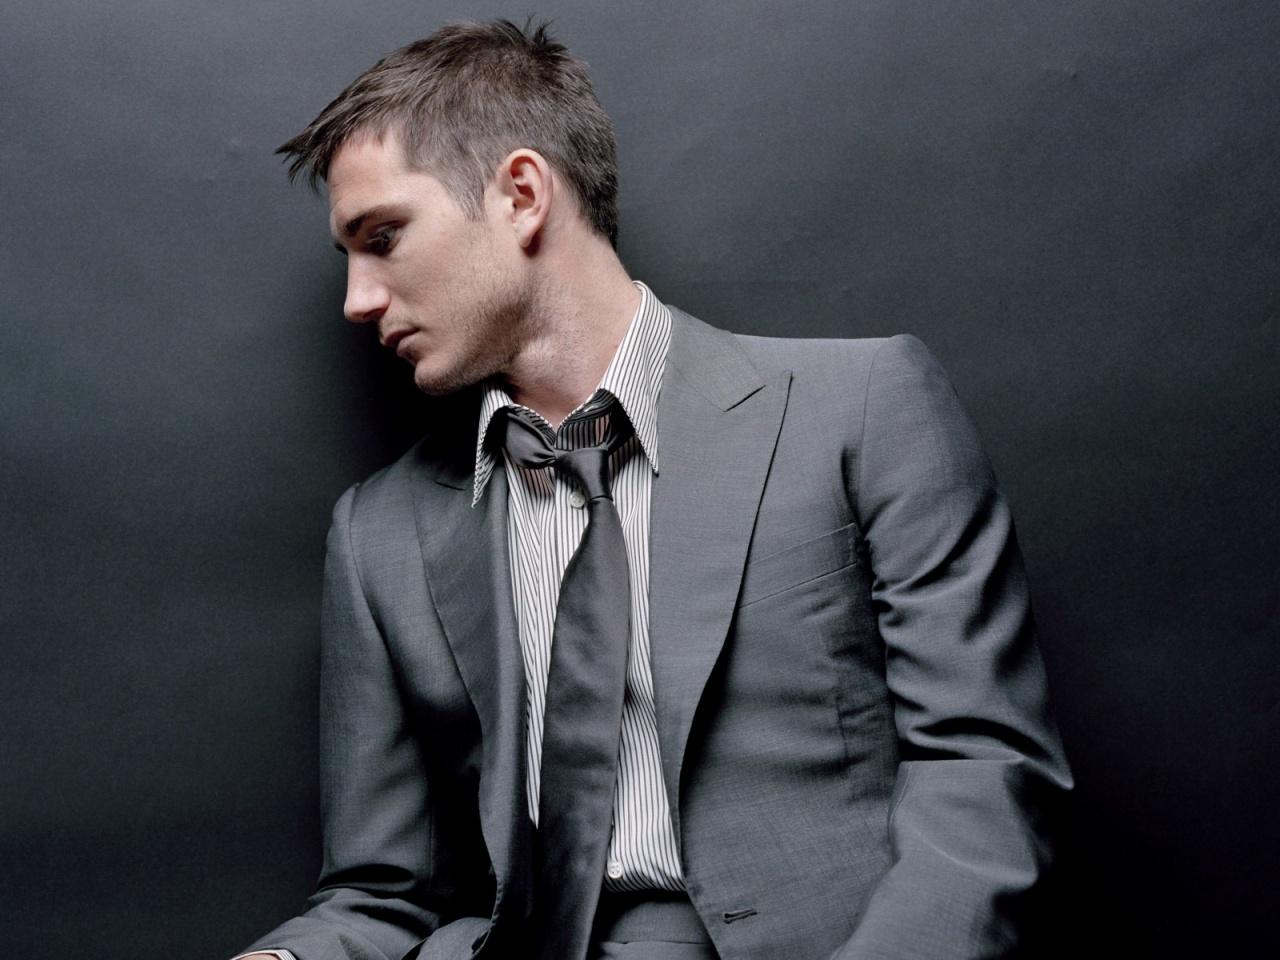 http://1.bp.blogspot.com/-wnbQXRtmfJI/TycgG_PjA9I/AAAAAAAAAL0/JHmCDVLqH08/s1600/man-in-grey-suit-wallpapers_11681_1280x960.jpg